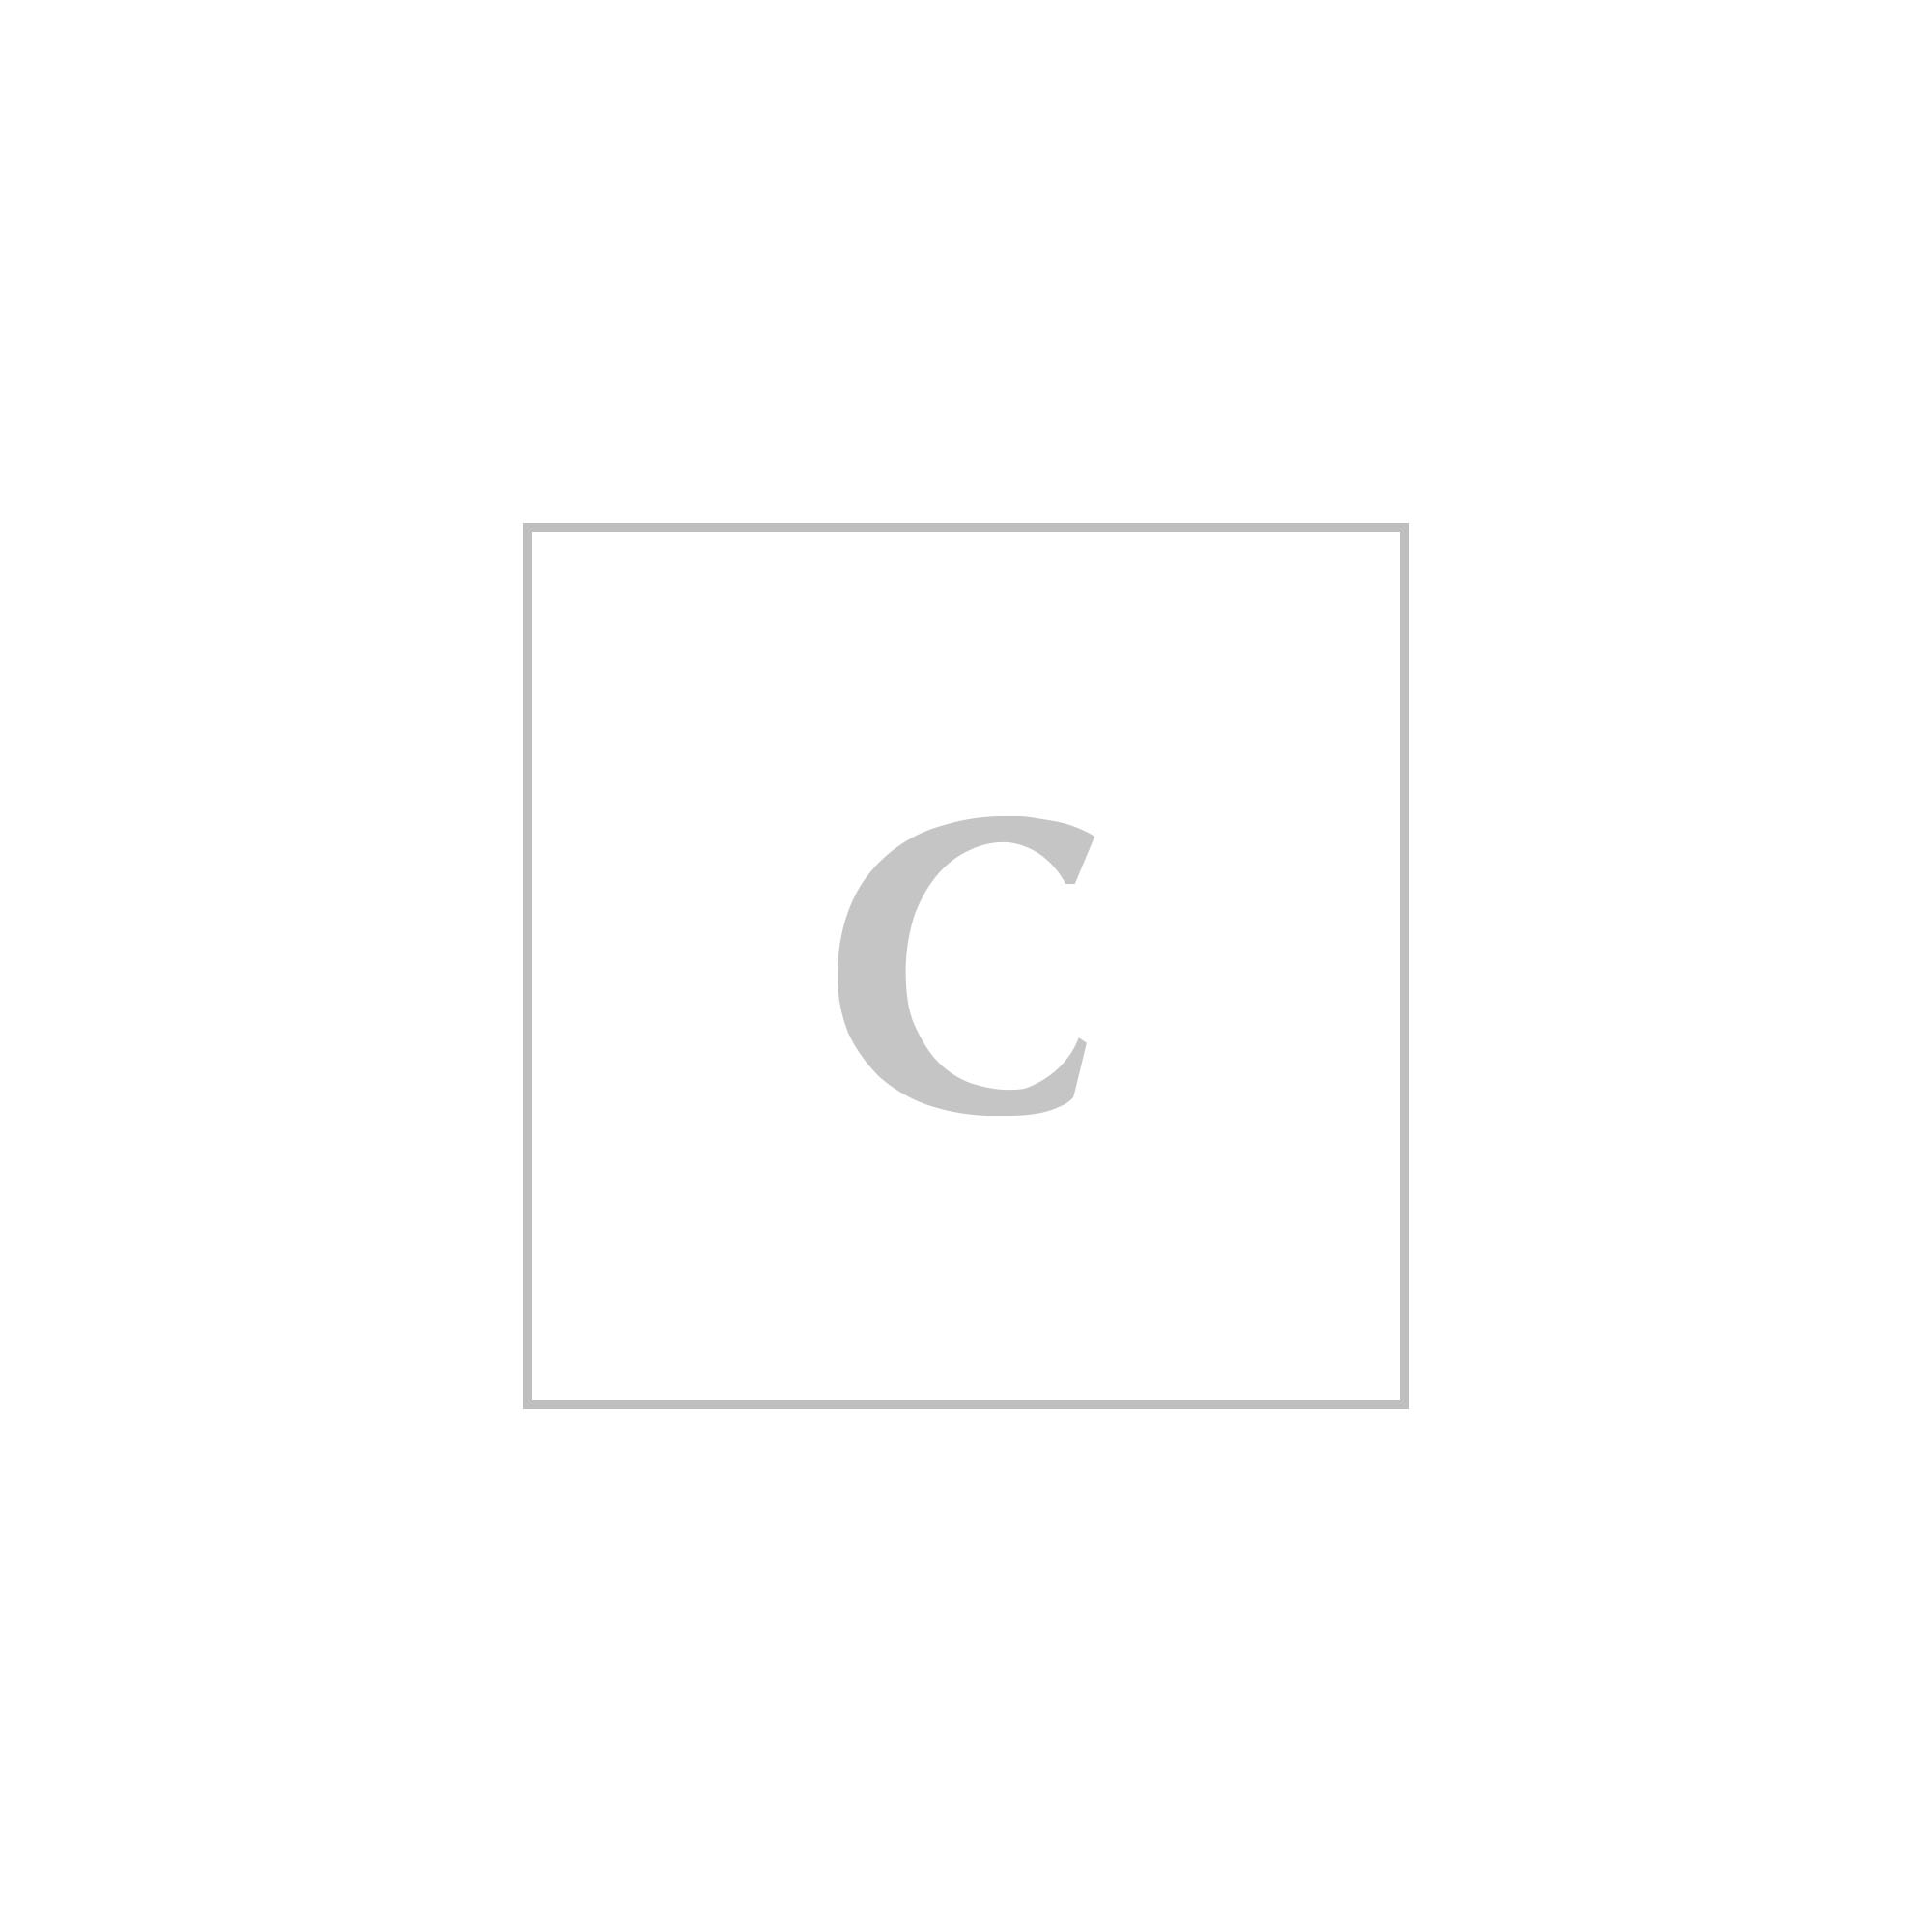 stella mccartney borse donna clutch falabella